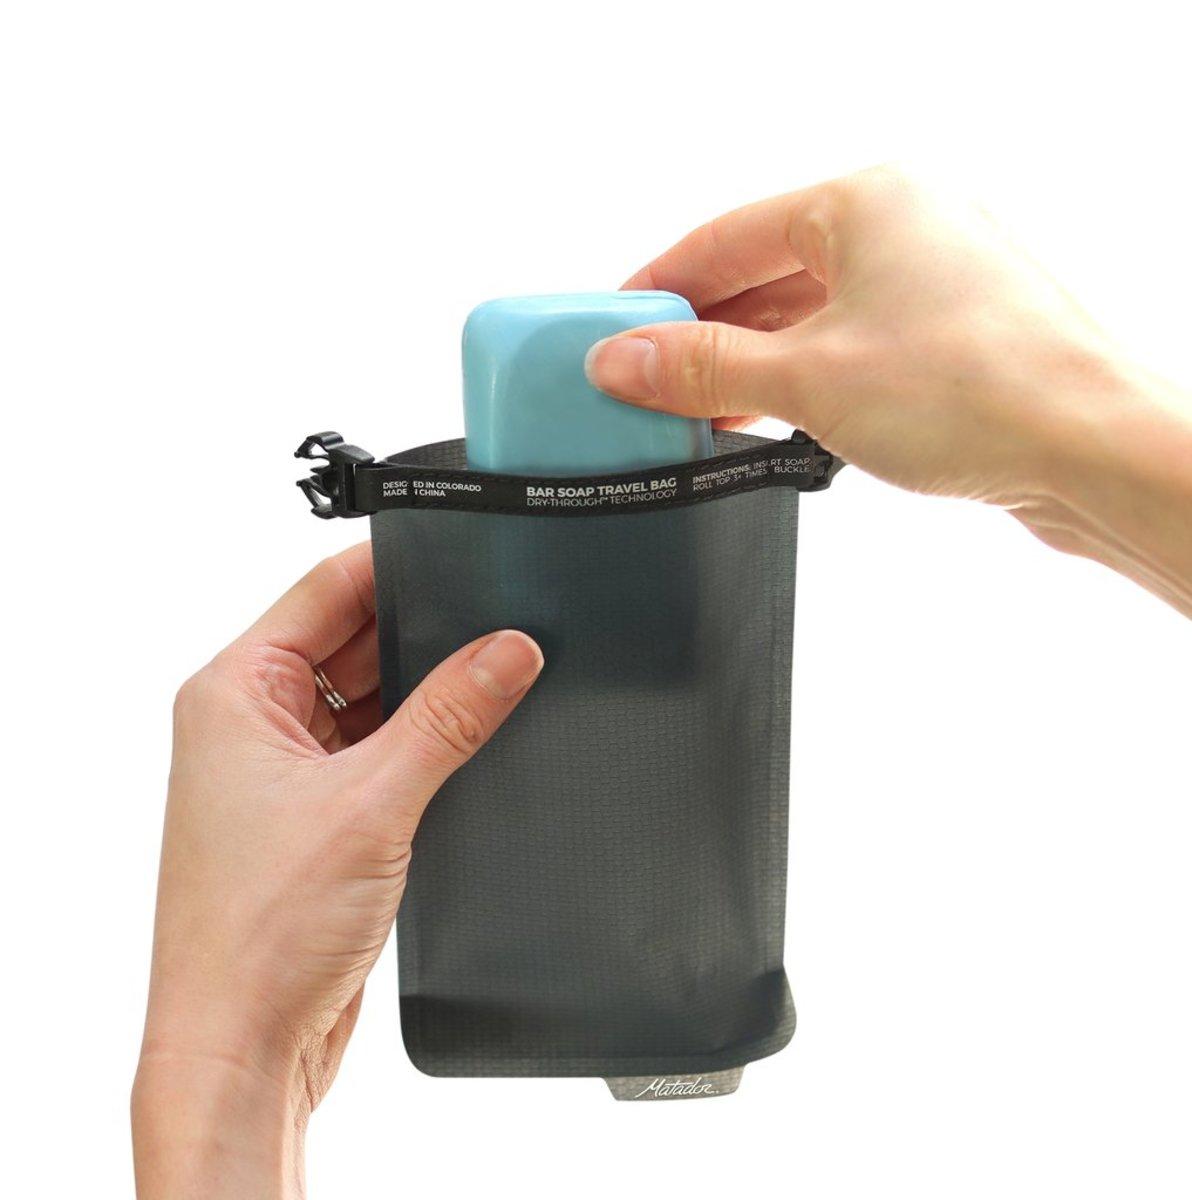 Matador Hk Flatpak Soap Bar Case Leak Proof Welded Hktvmall Toiletry Bottle 1 Pack Photo Description